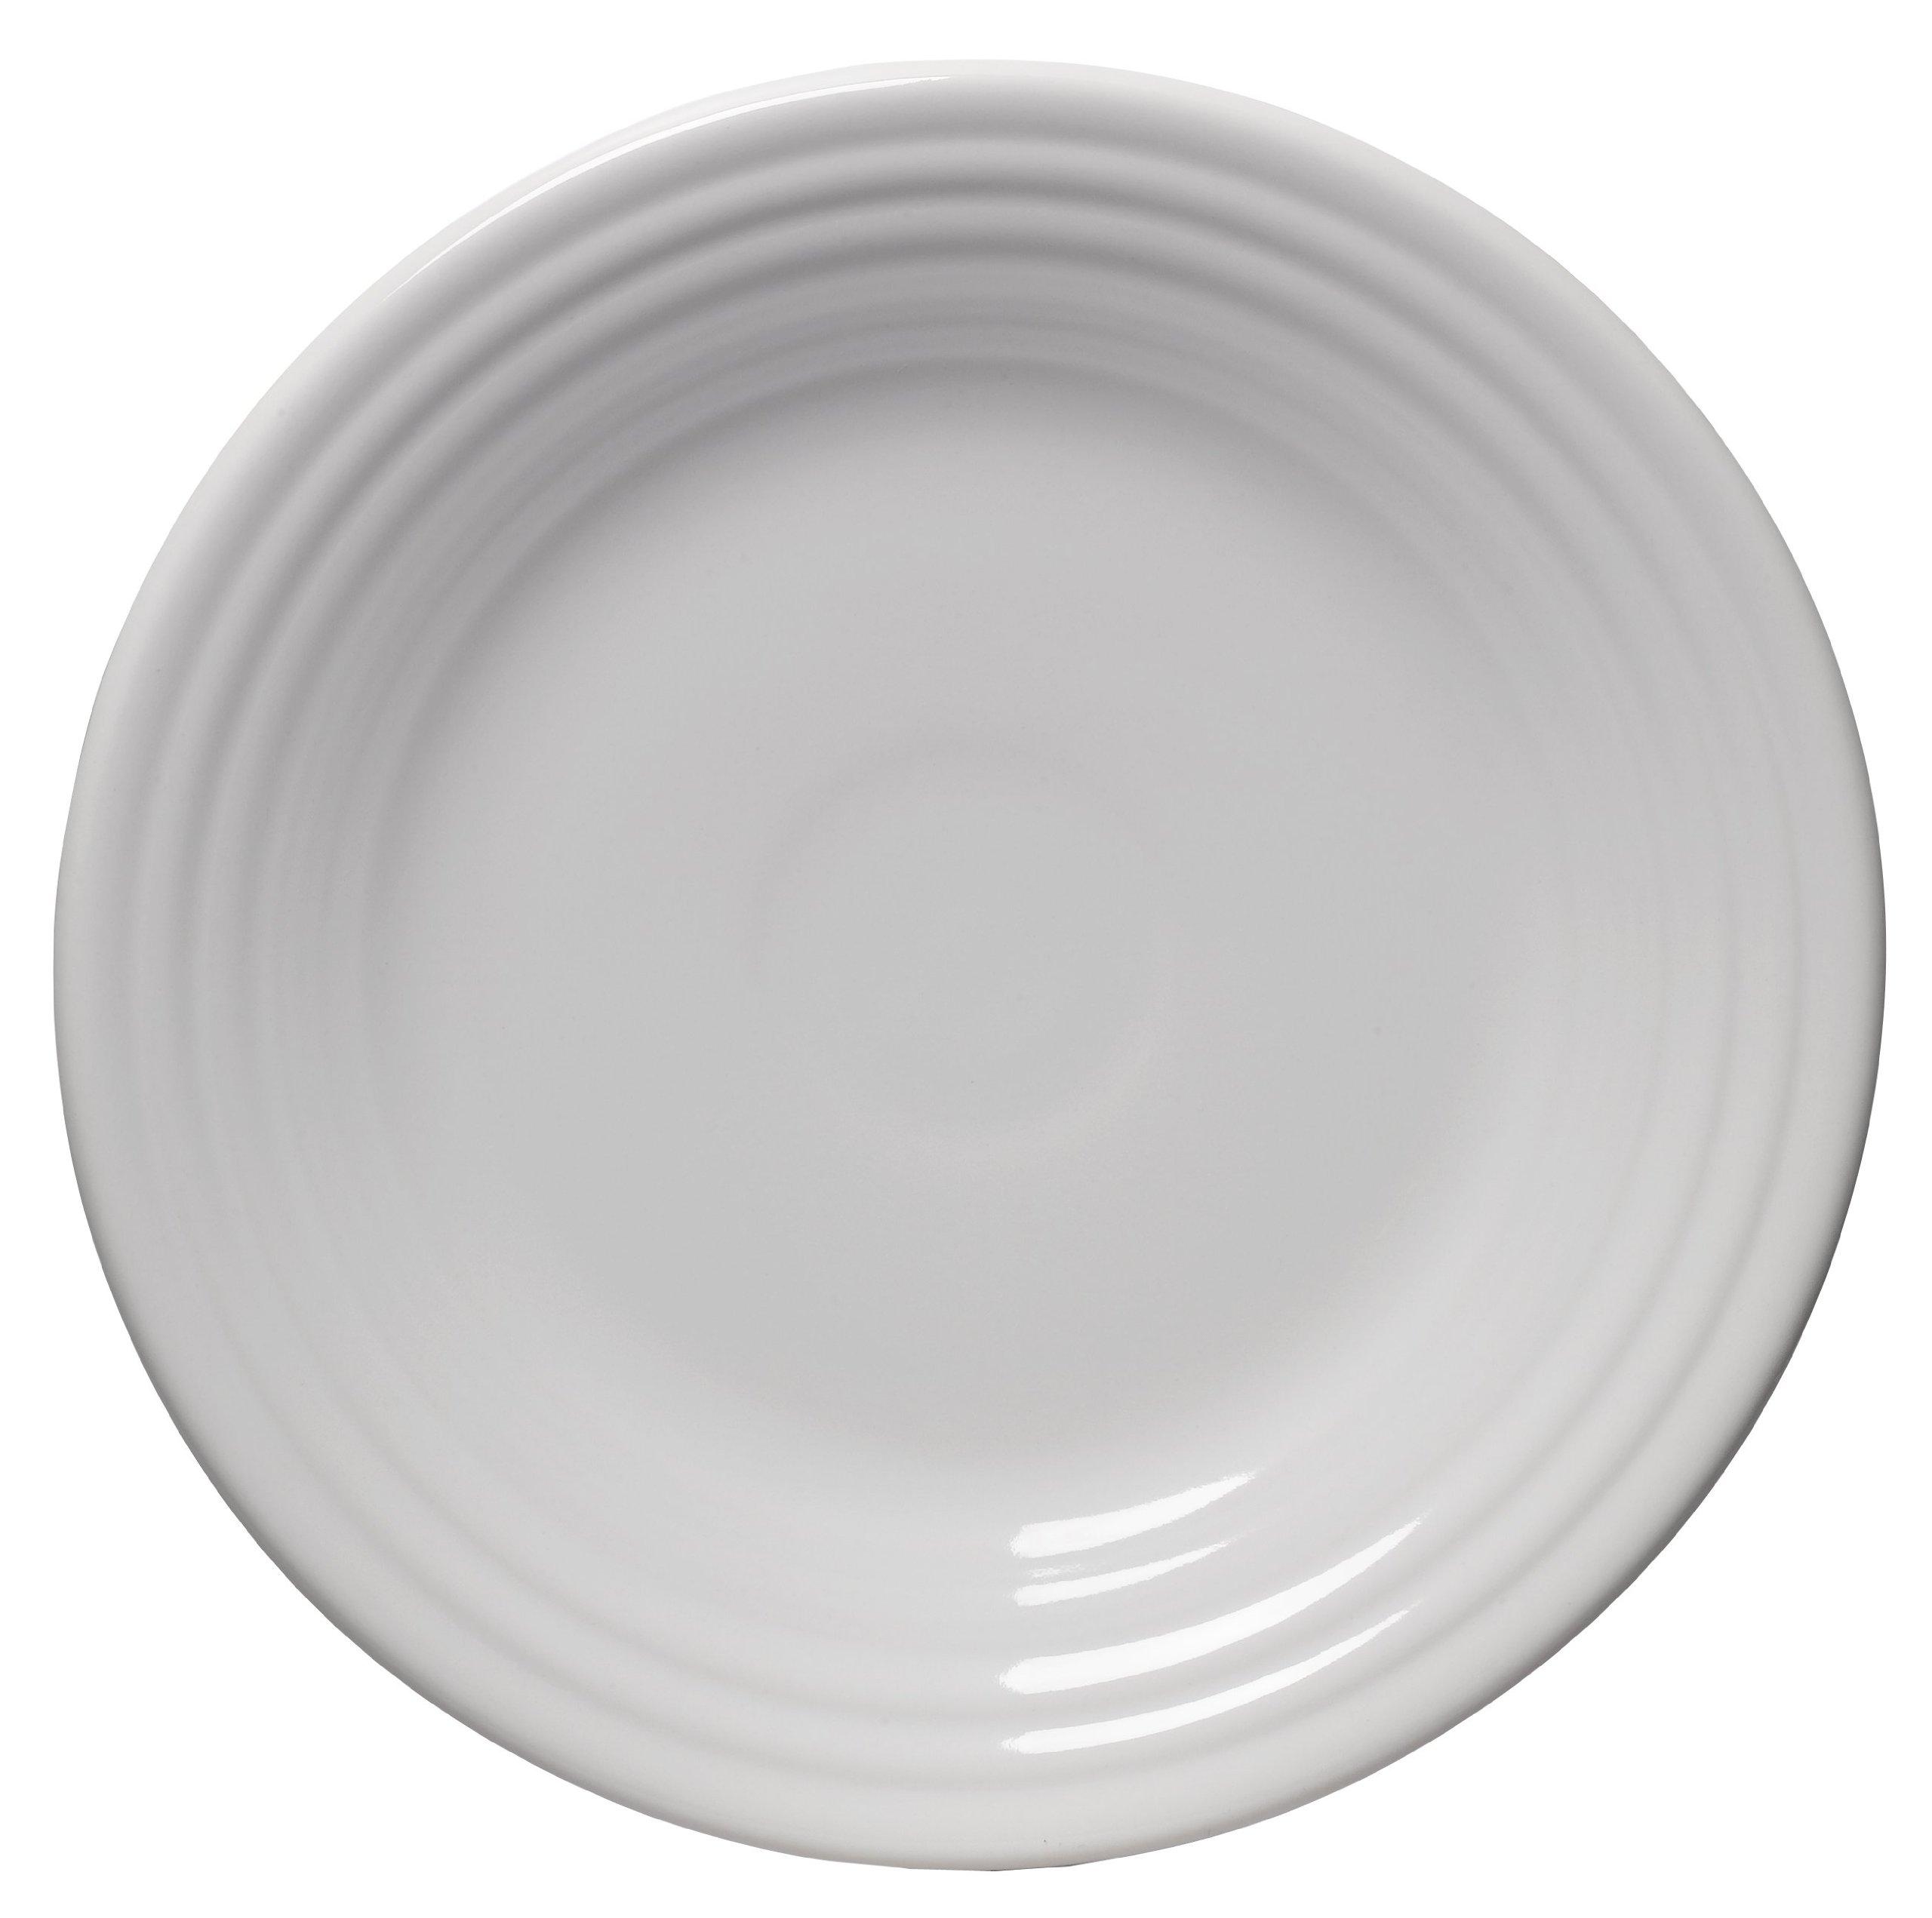 Fiesta 9-Inch Luncheon Plate, White